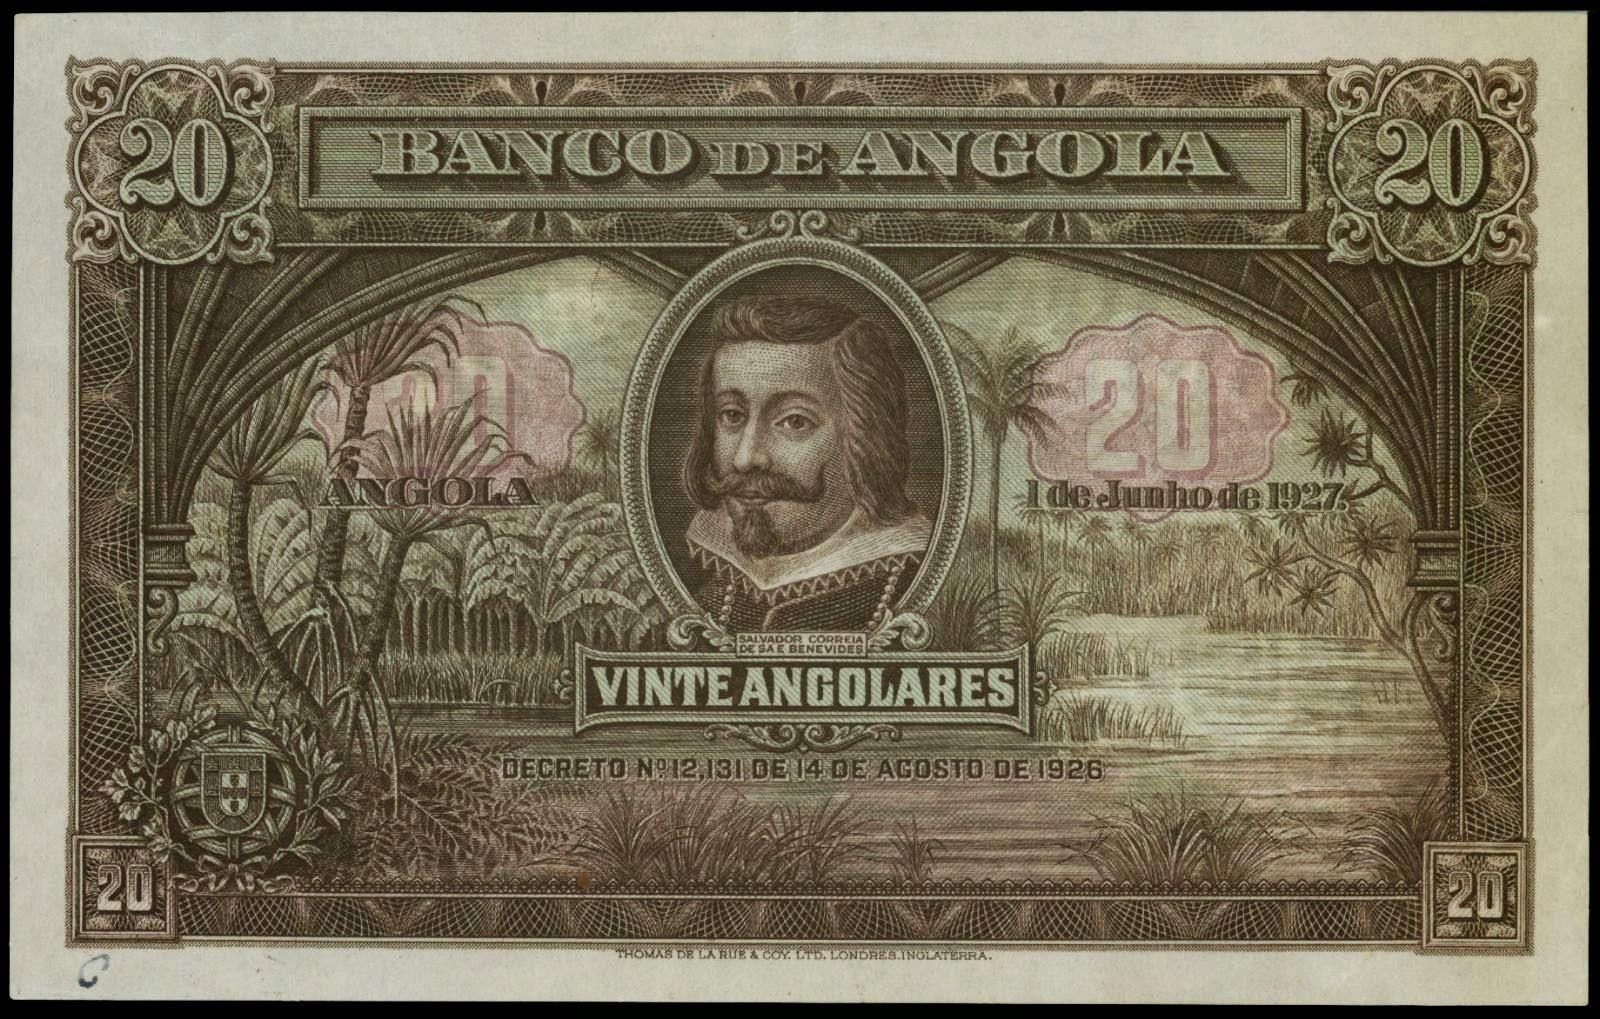 Angola 20 Angolares banknote 1927 Salvador Correia